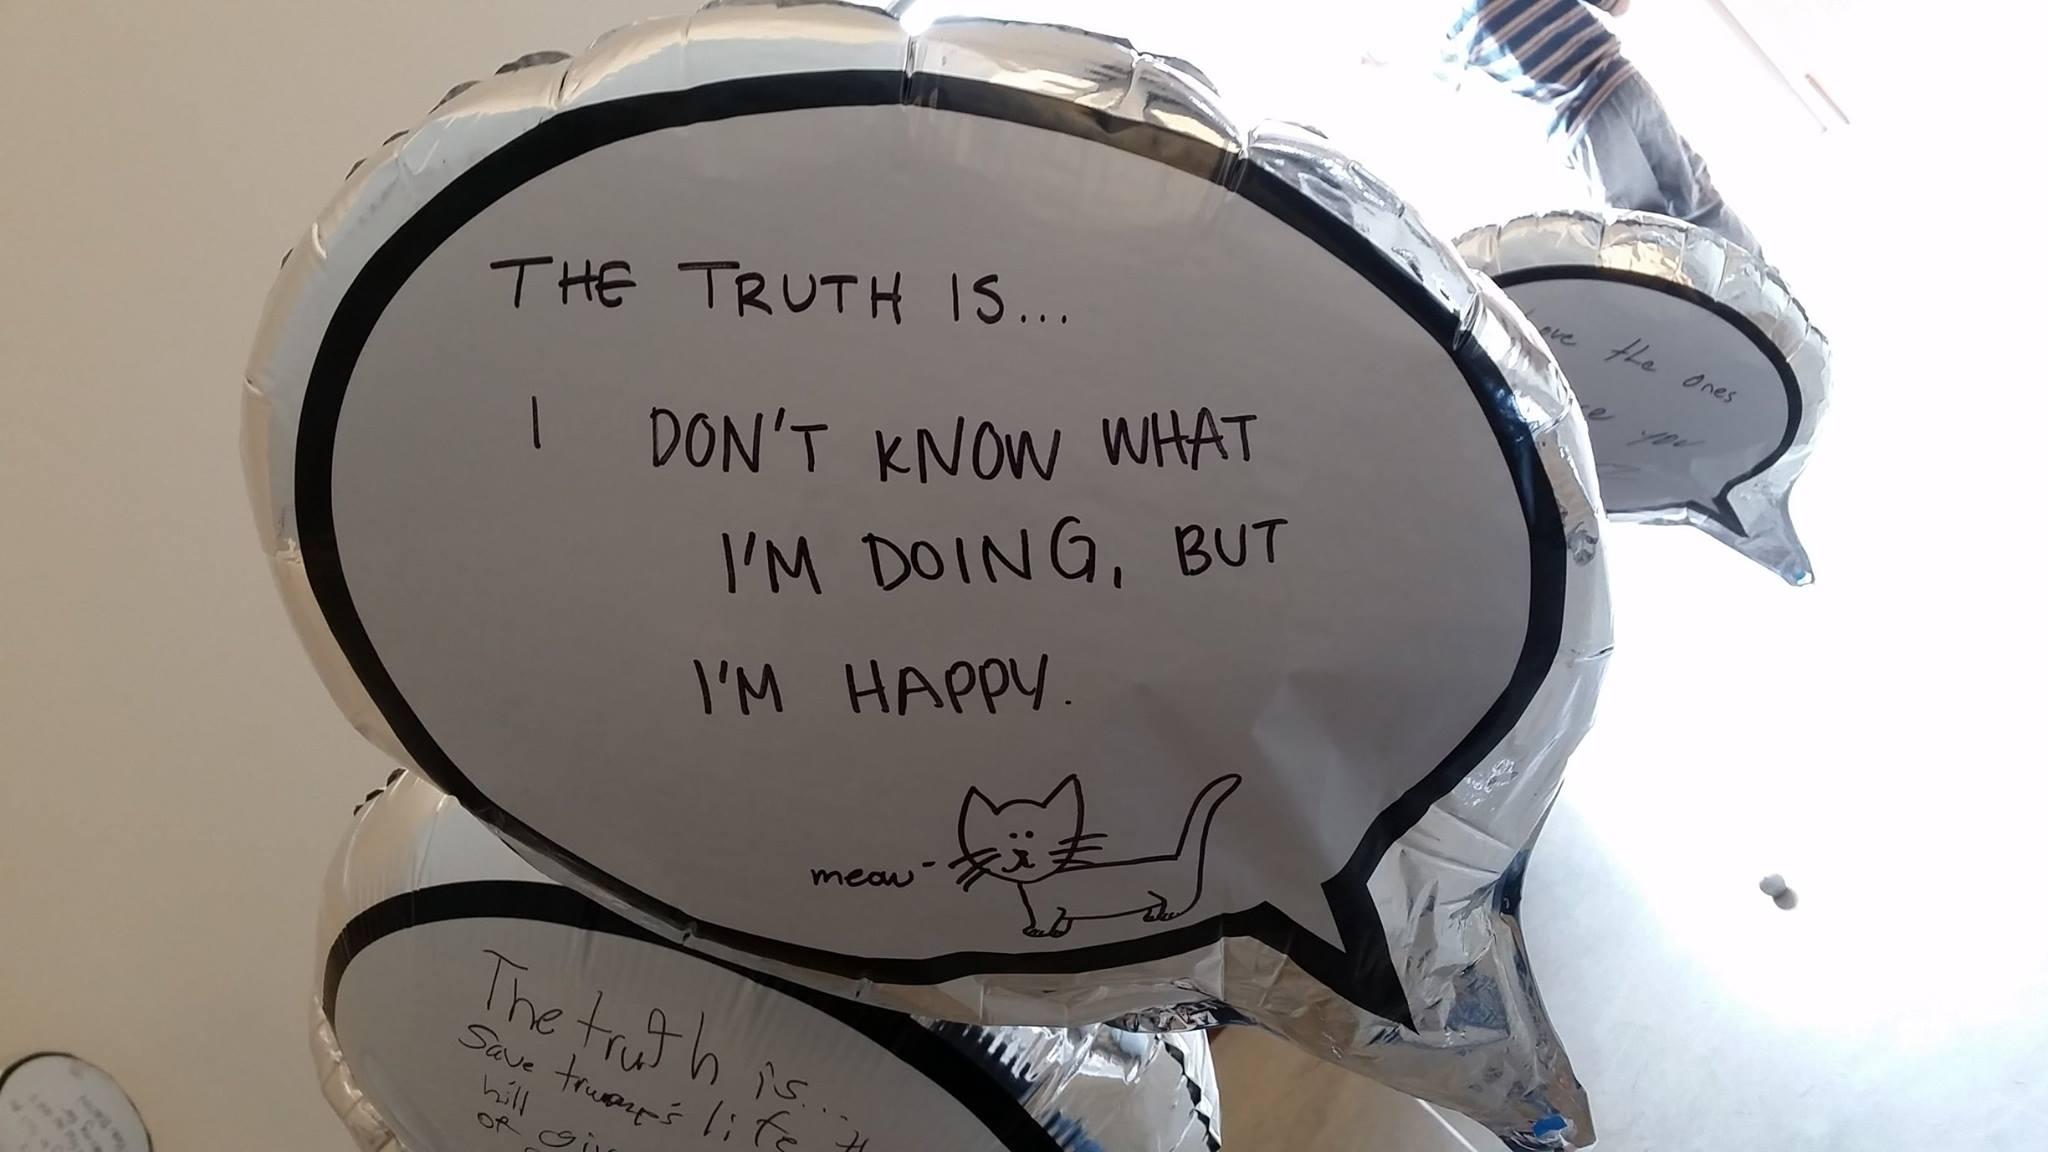 truth booth02.jpg